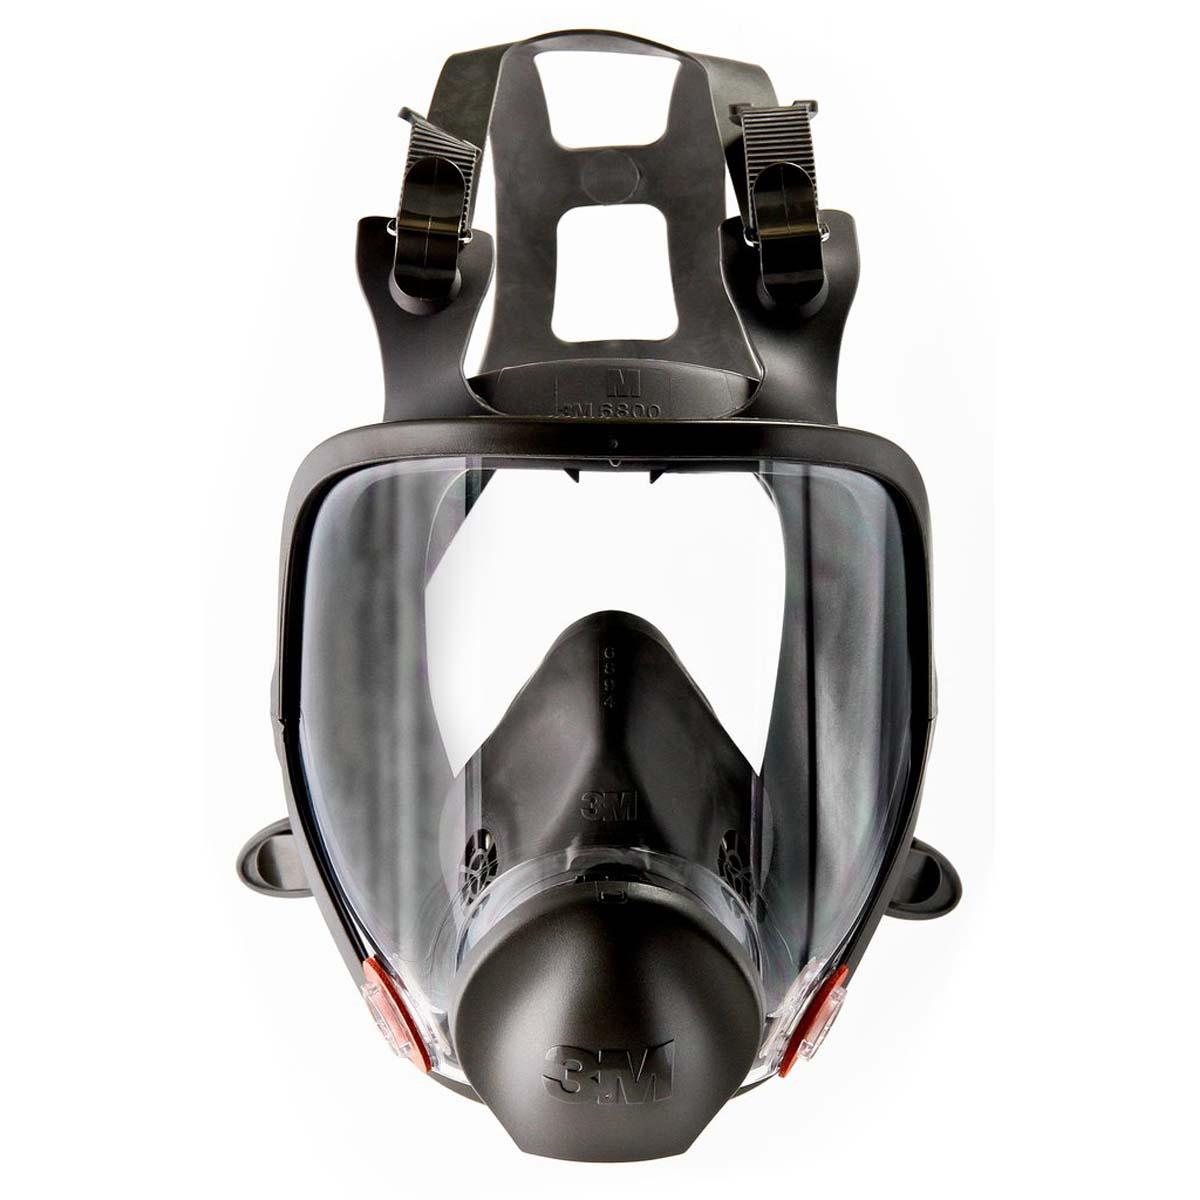 "3Mâ""¢ Full Facepiece Reusable Respirator 6800 Medium"